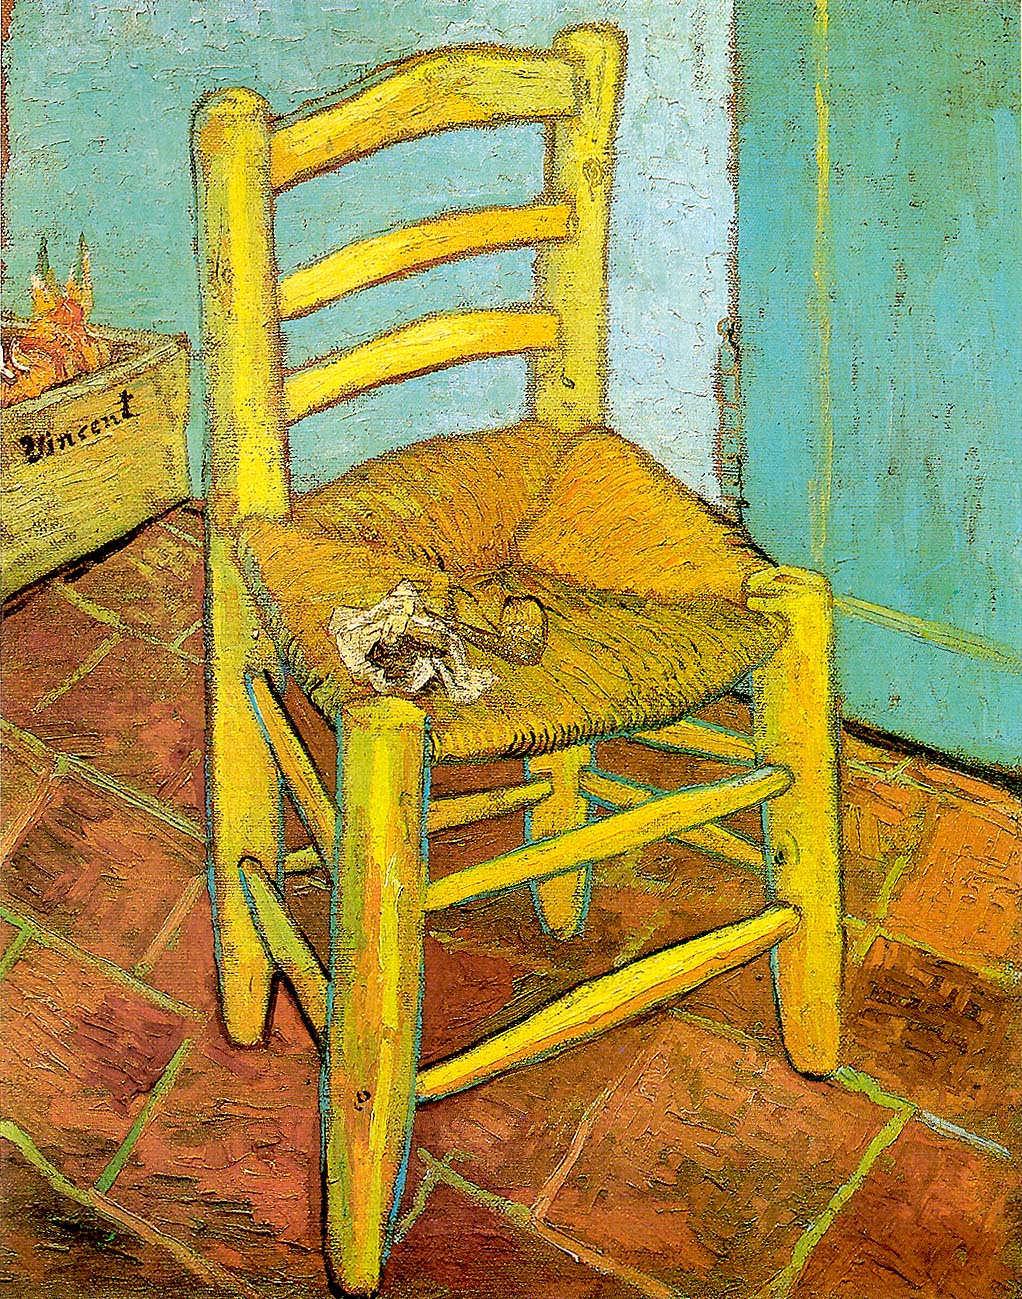 Vincent van Gogh, Van Goghs Stuhl, ca. 20. November 1888, Öl auf Jute, 93 x 73,5 cm (The National Gallery, London)